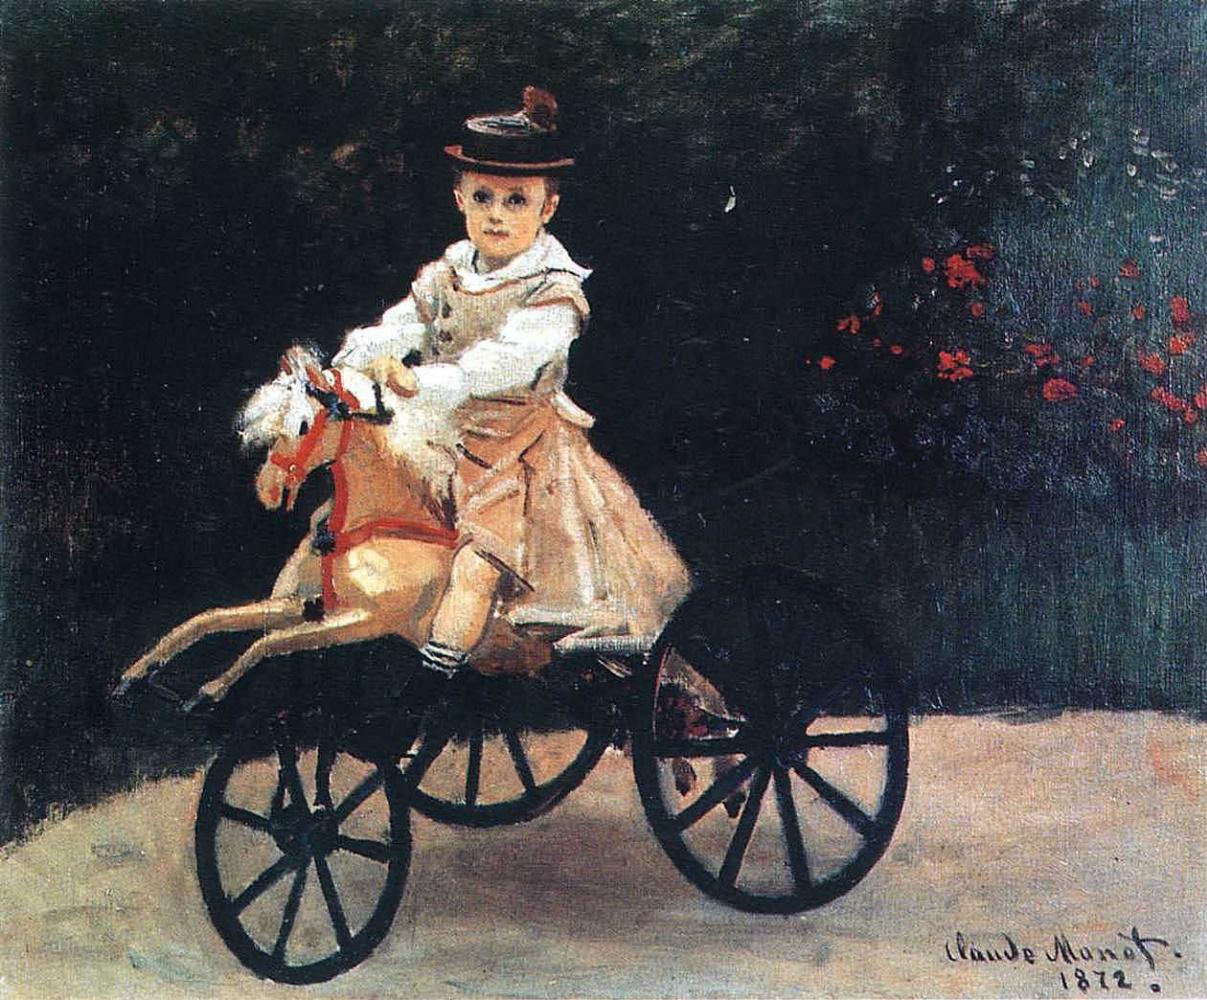 Claude Monet. Jean Monet on a horse